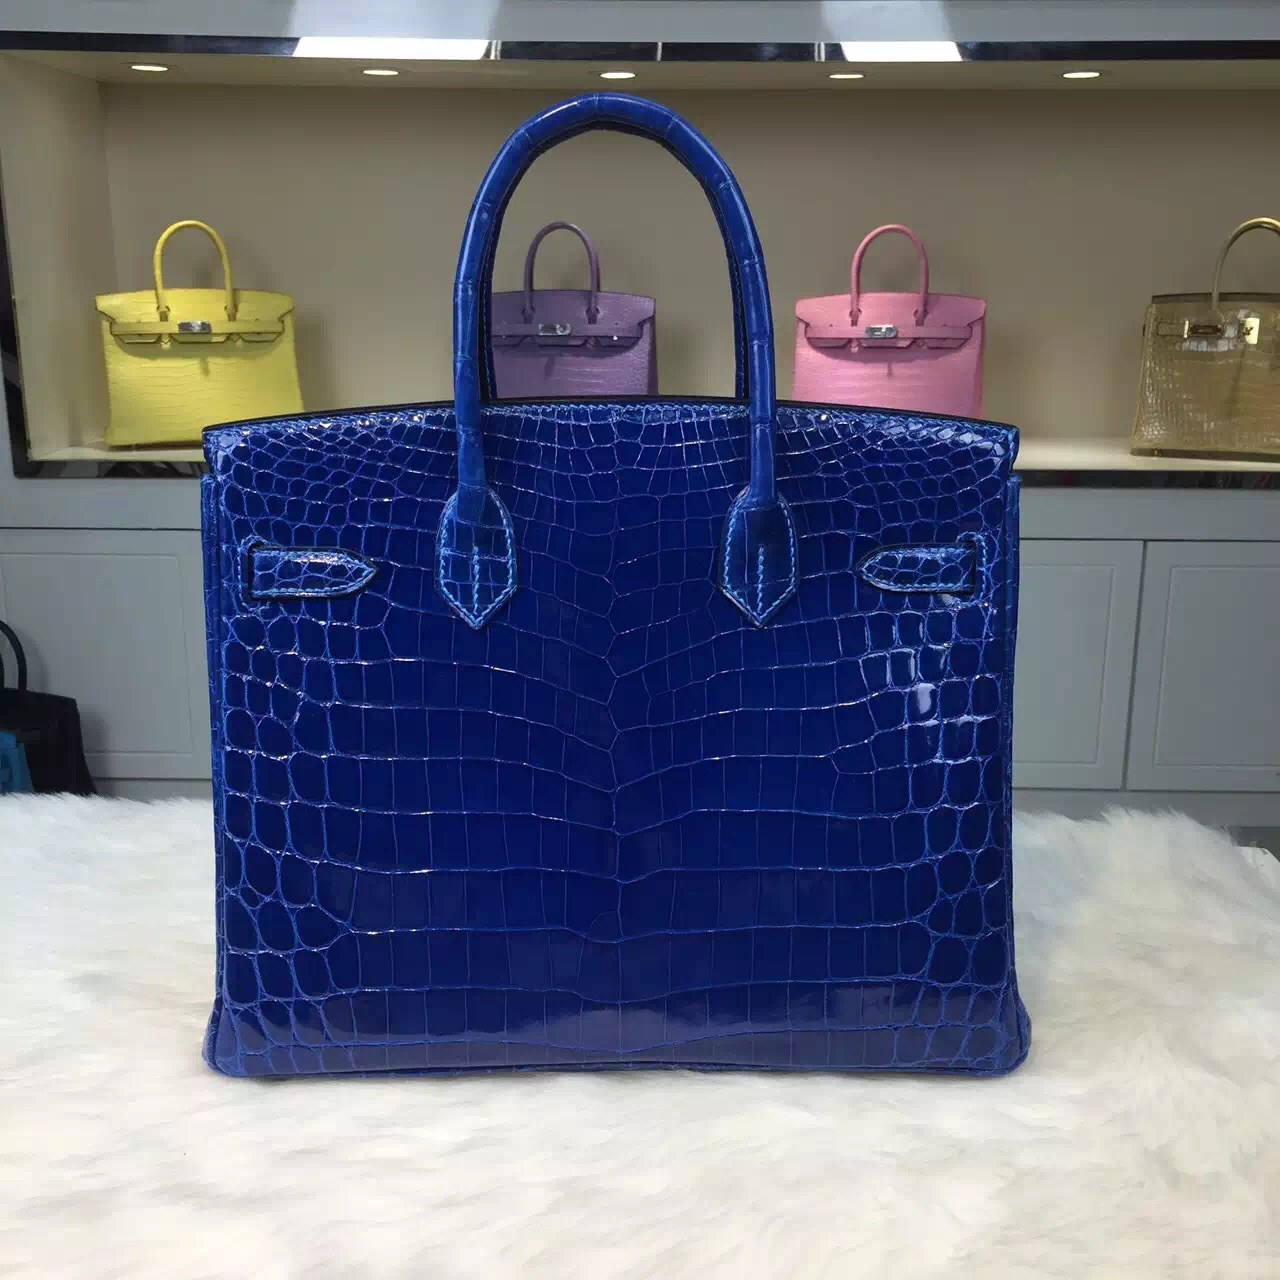 Hand Stitching Hermes Birkin Bag 7Q Mykono Blue Crocodile Leather Ladies' Tote Bag 30cm